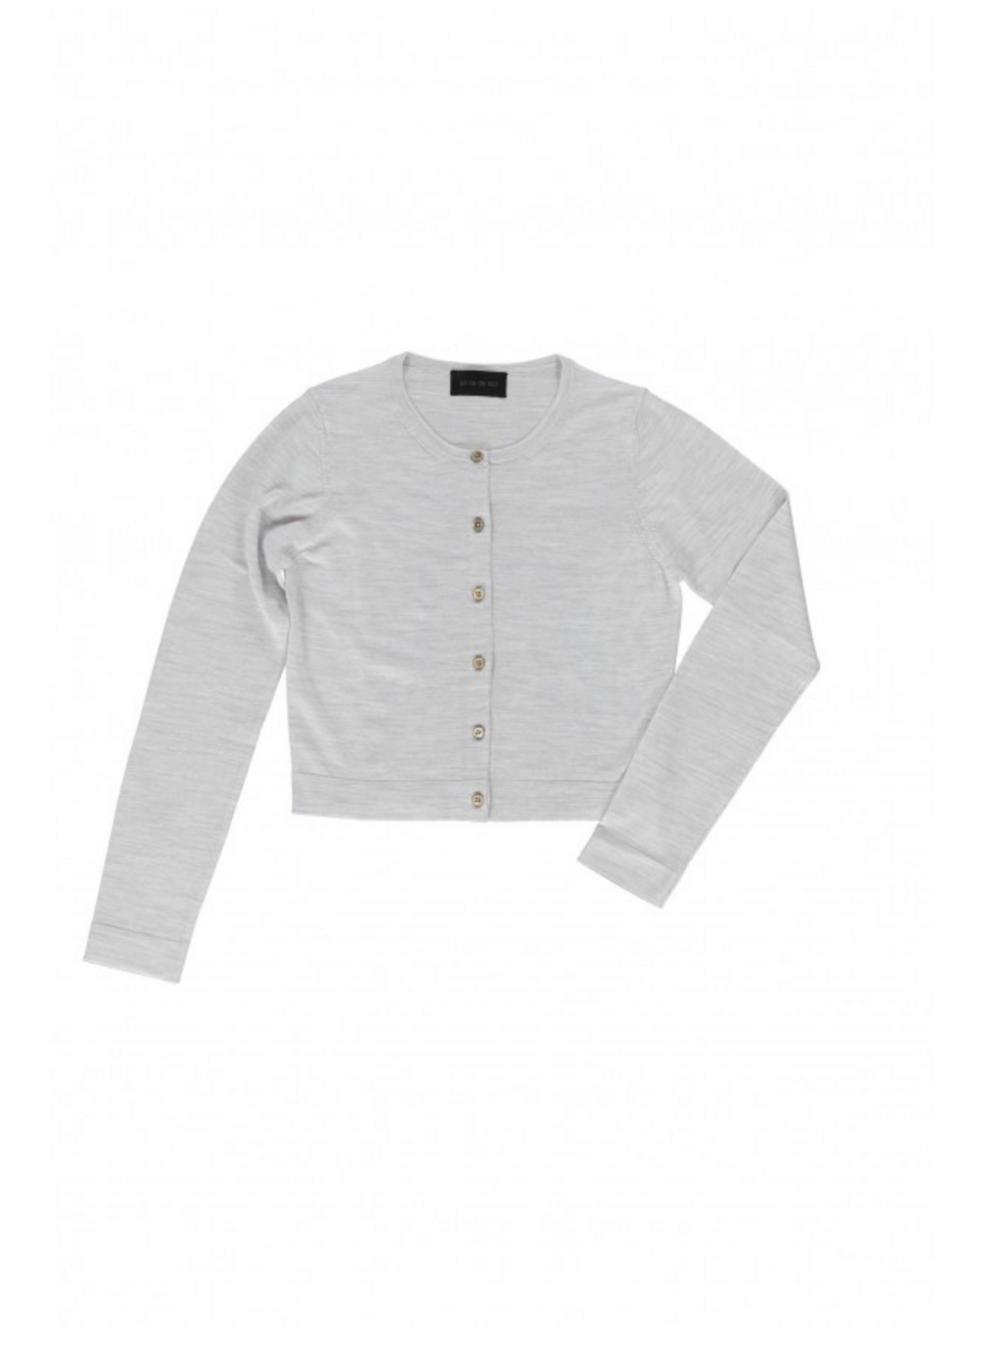 cavadesoi_knitwear_kelly